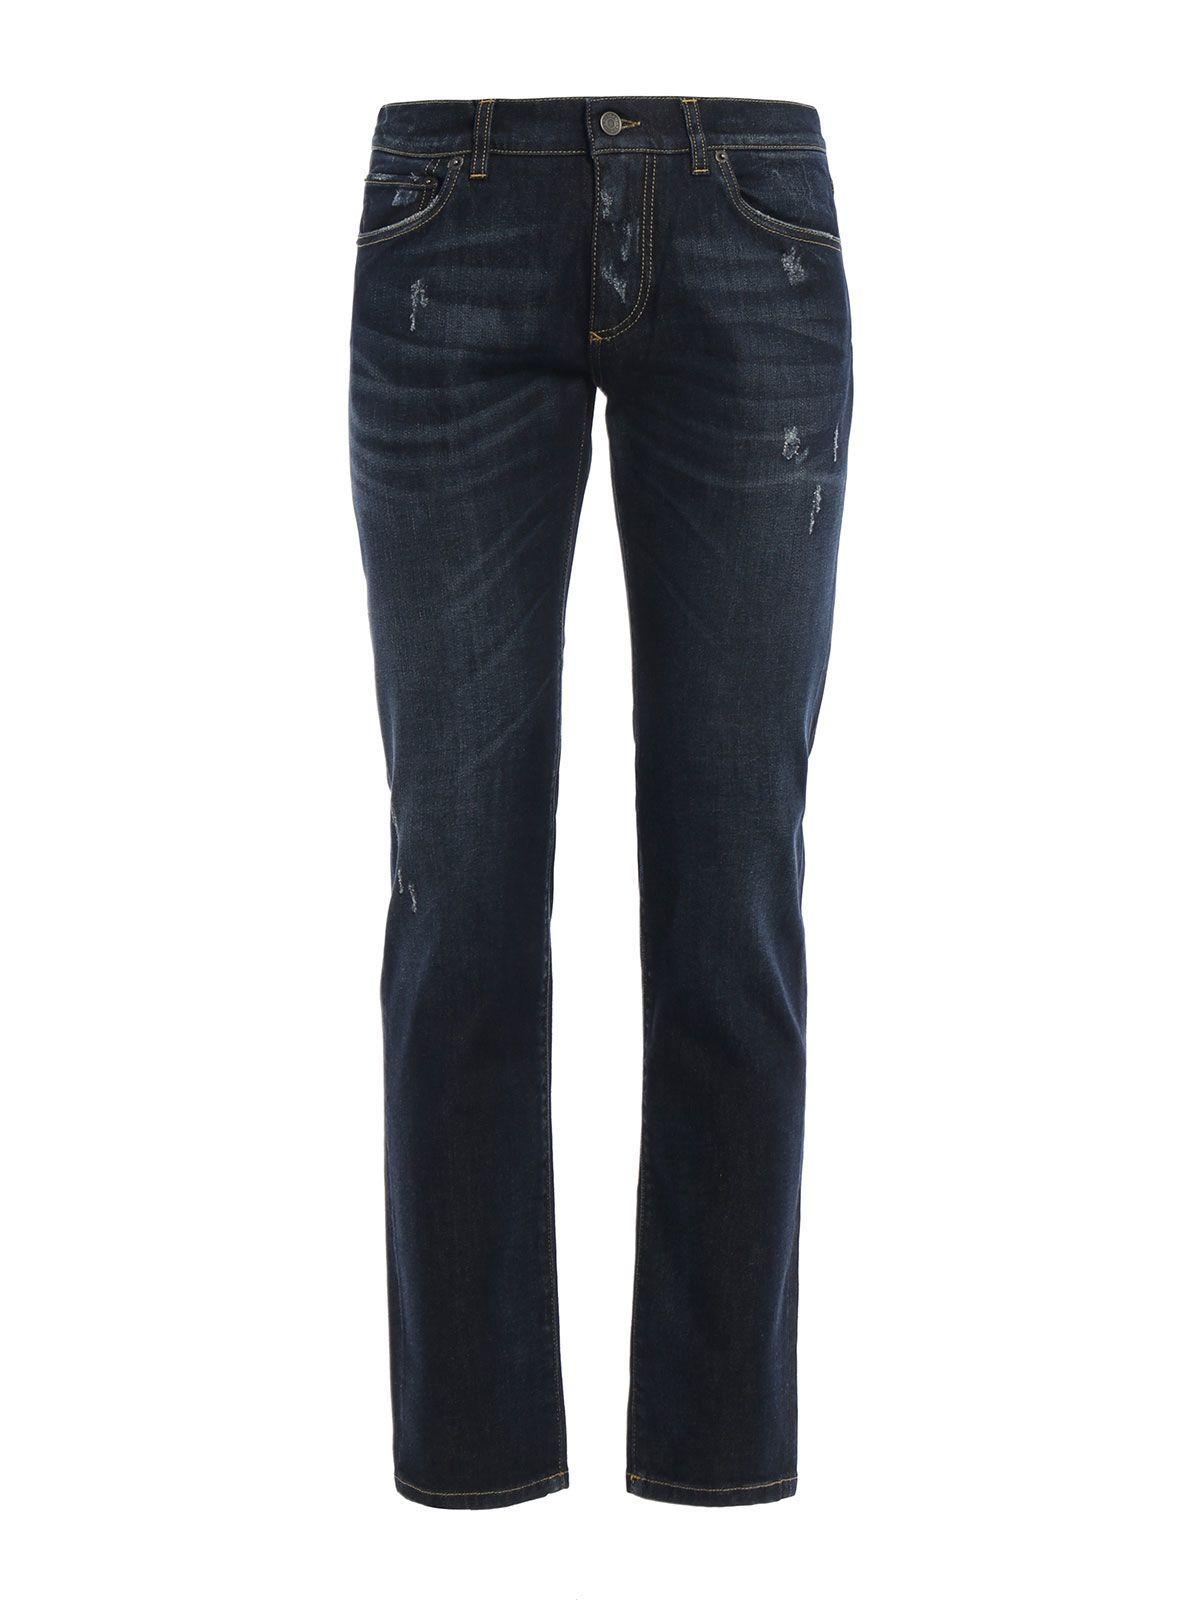 Dolce & Gabbana Dolce & Gabbana Distressed Jeans